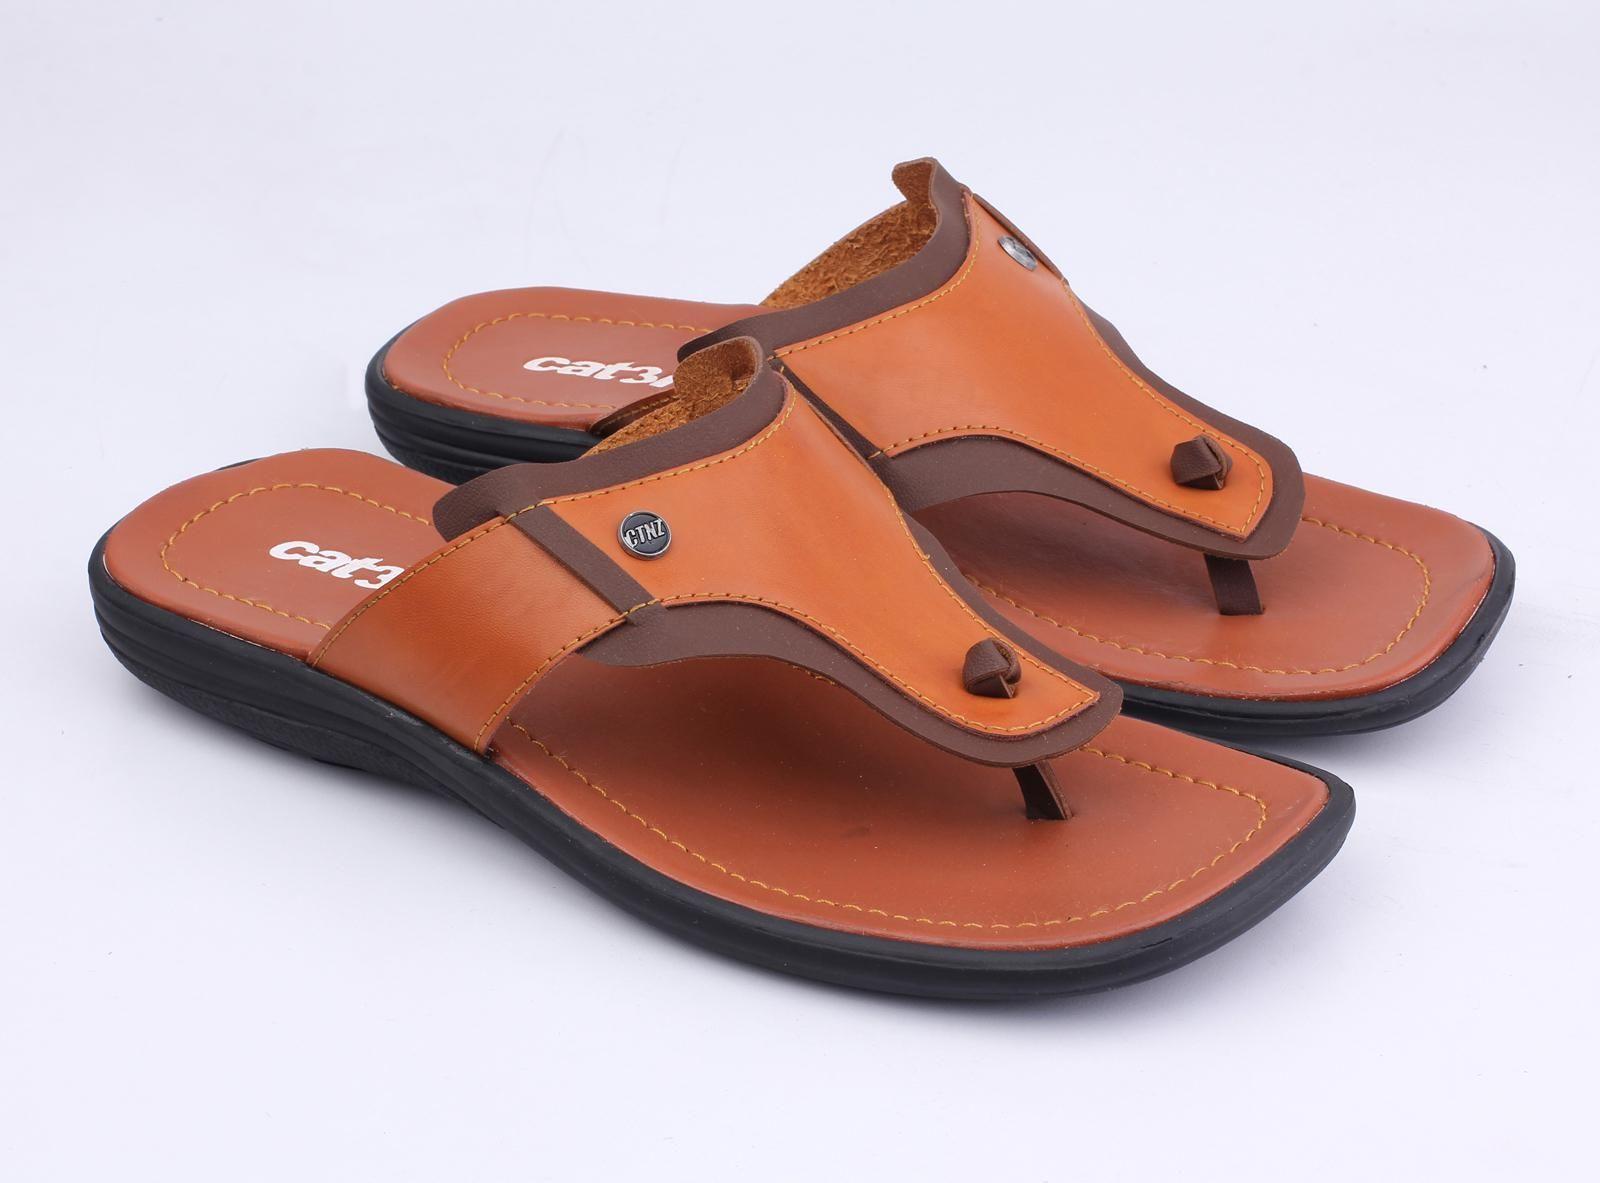 Sandal Pria Rs 018 Bushindo Shop Pria Sandal Pria Sandal